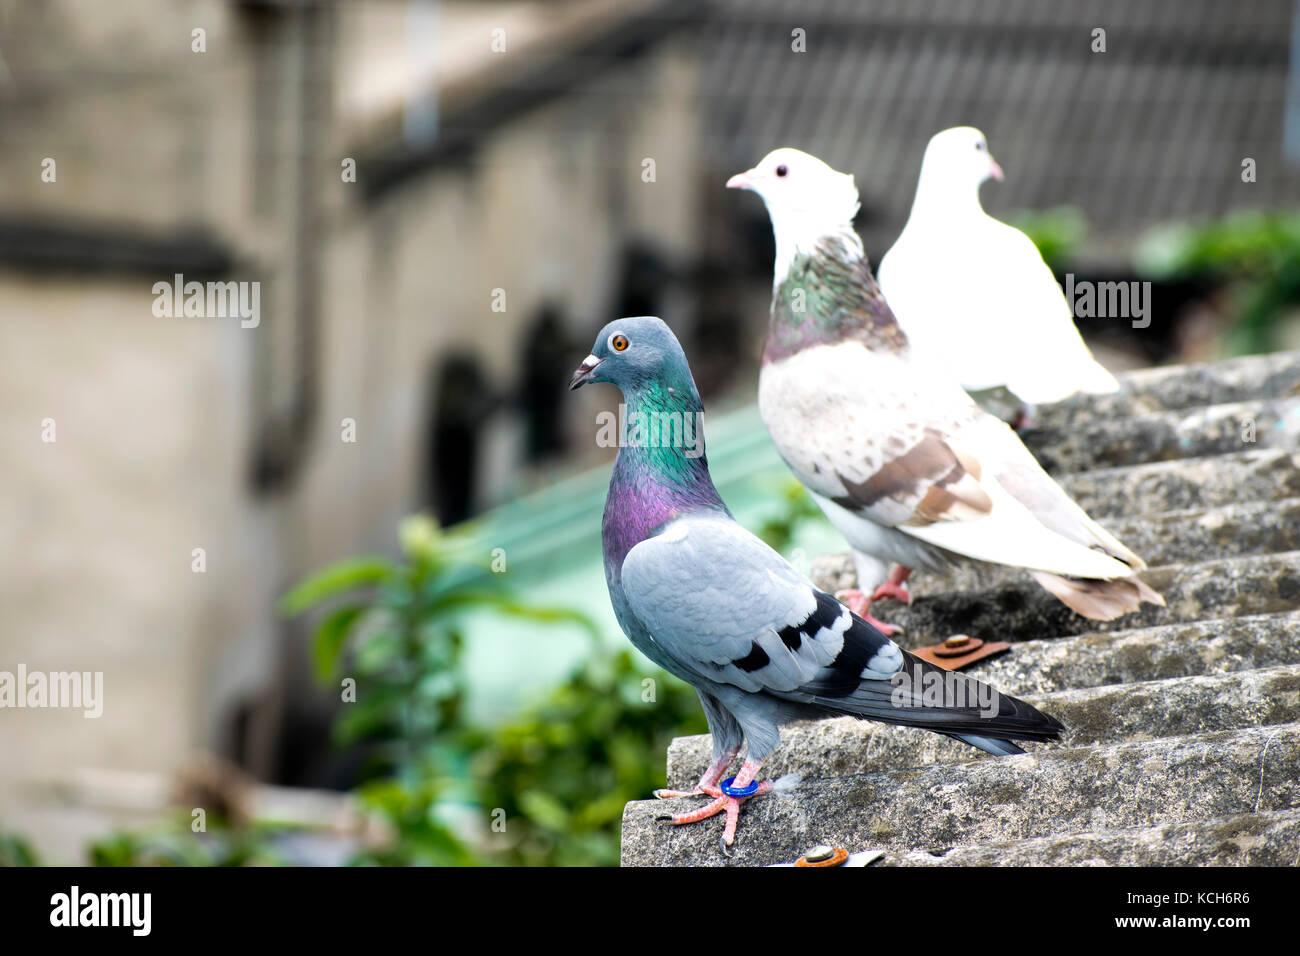 Mumtaztic Pigeon Loft  Pigeon Genetics  Pigeon Colors